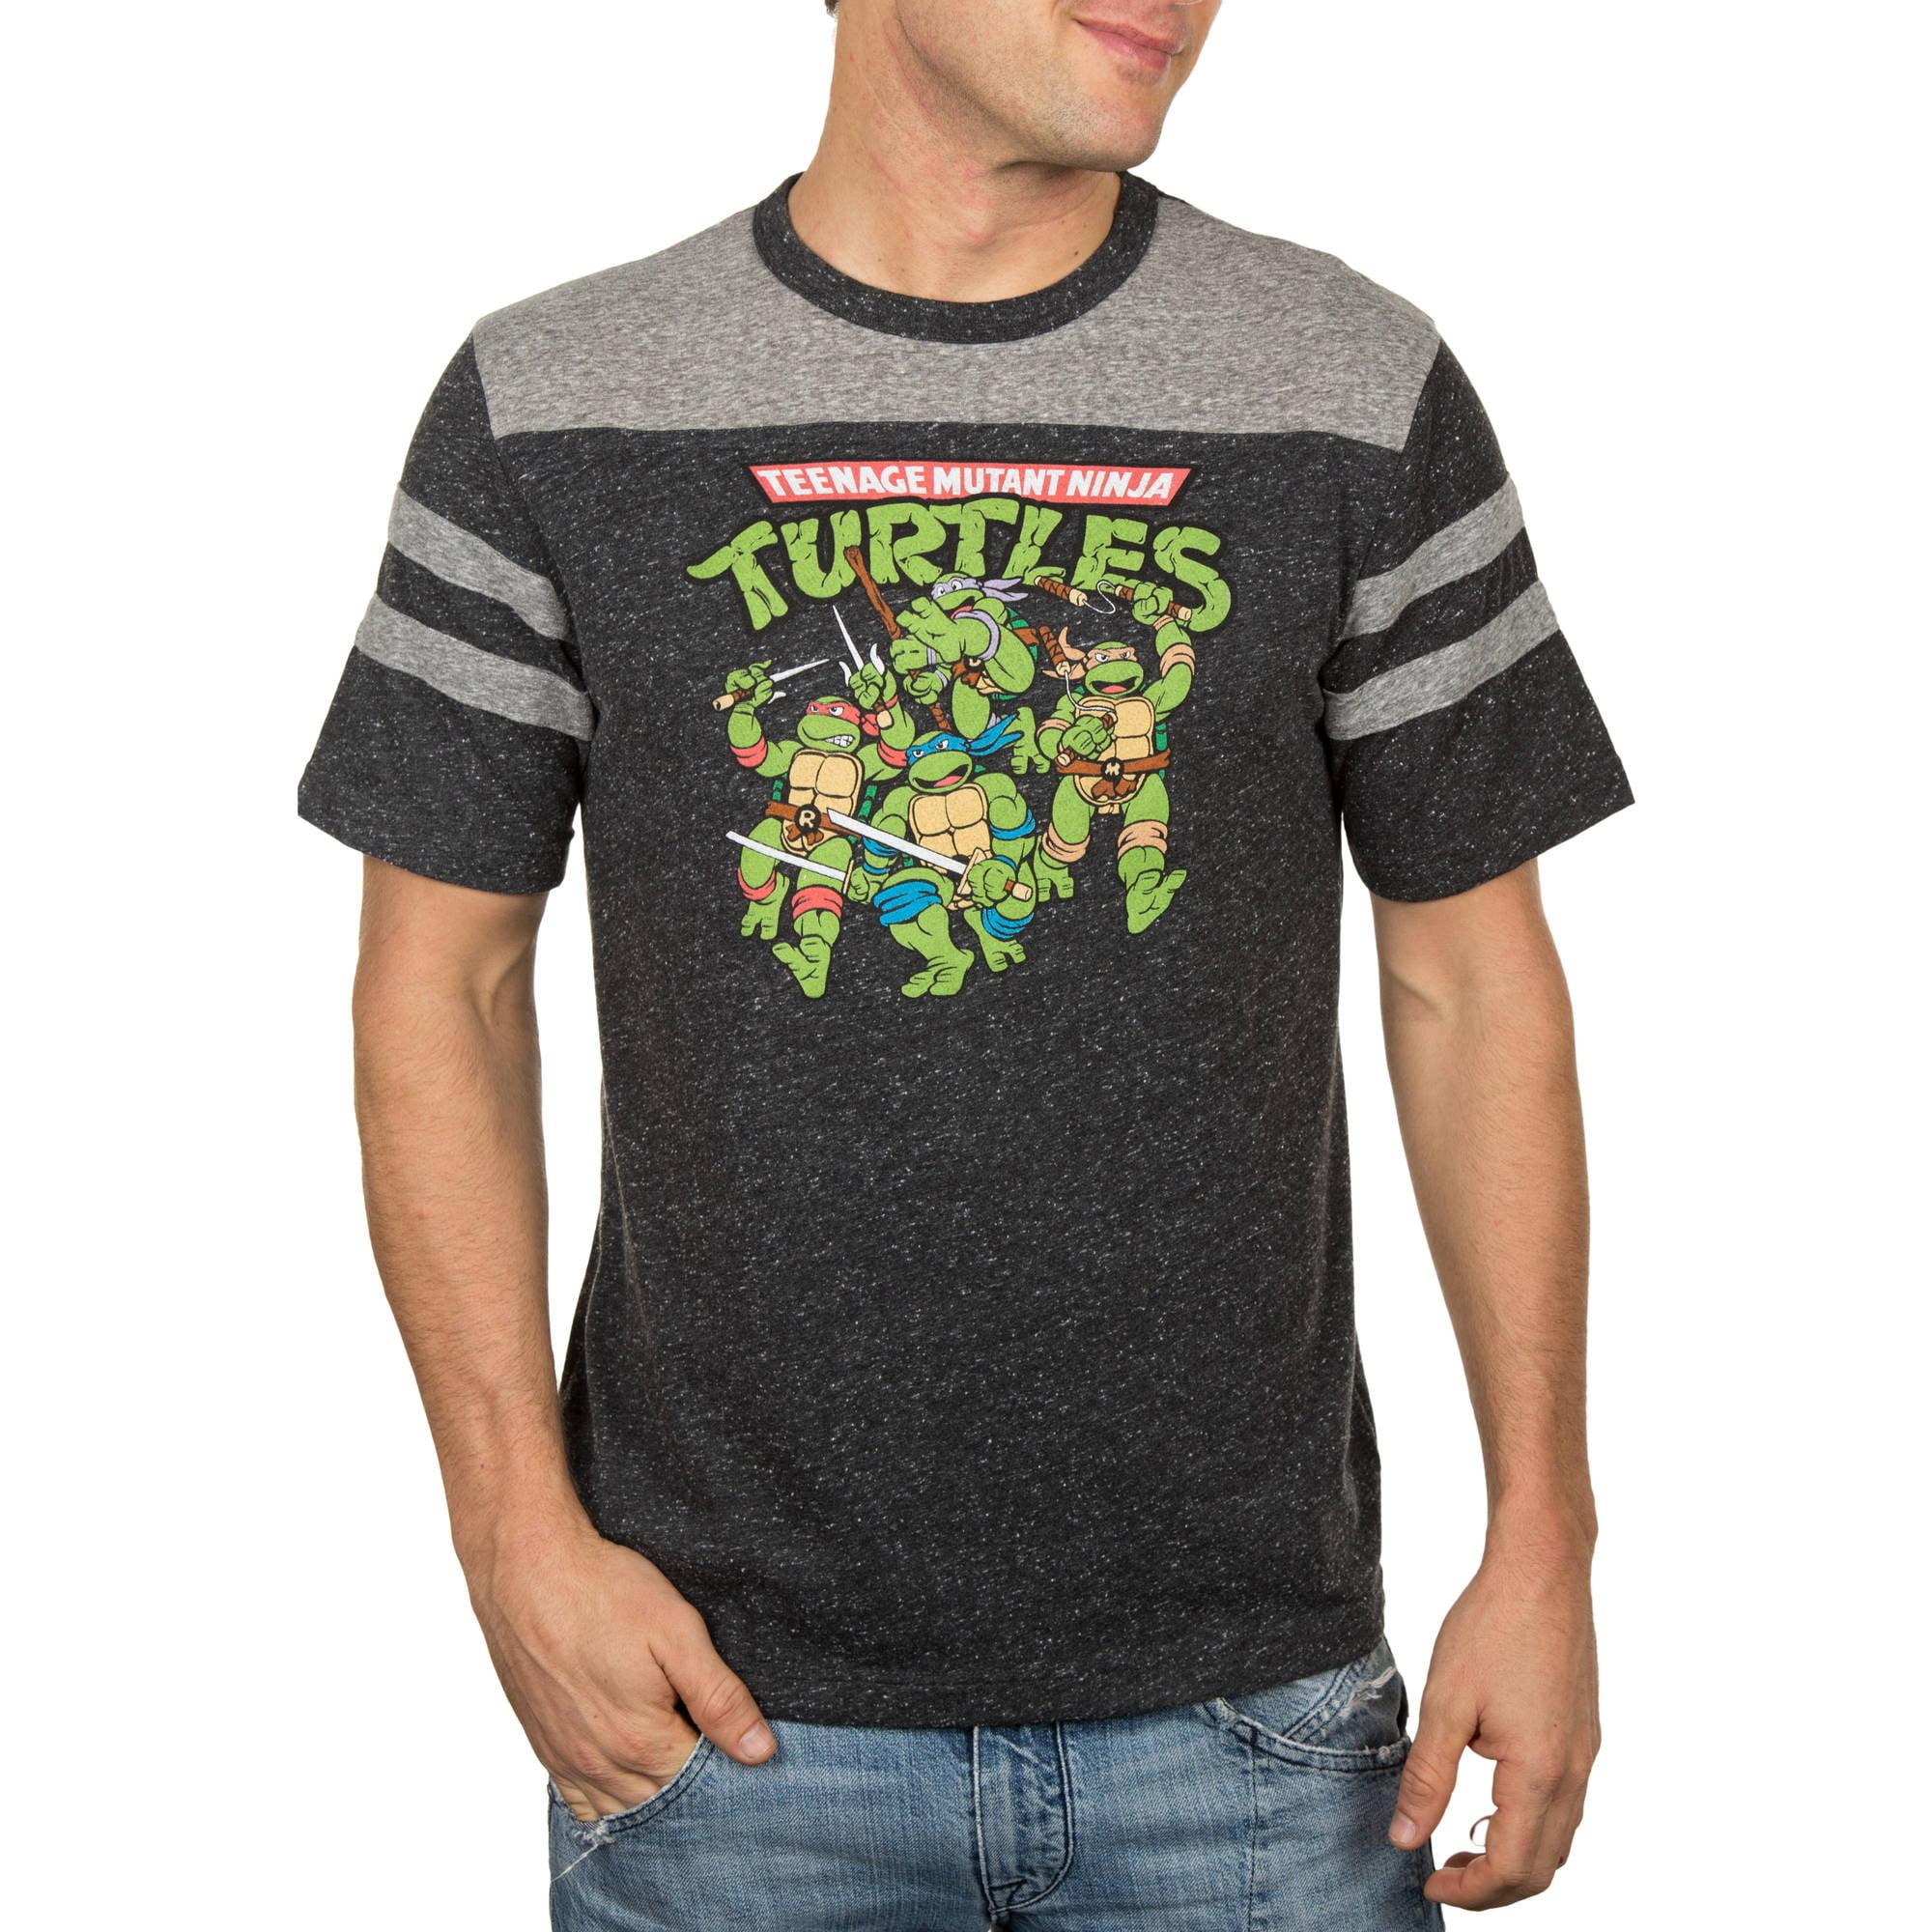 Teenage Mutant Ninja Turtle TMNT Group Action Men's Graphic Tee